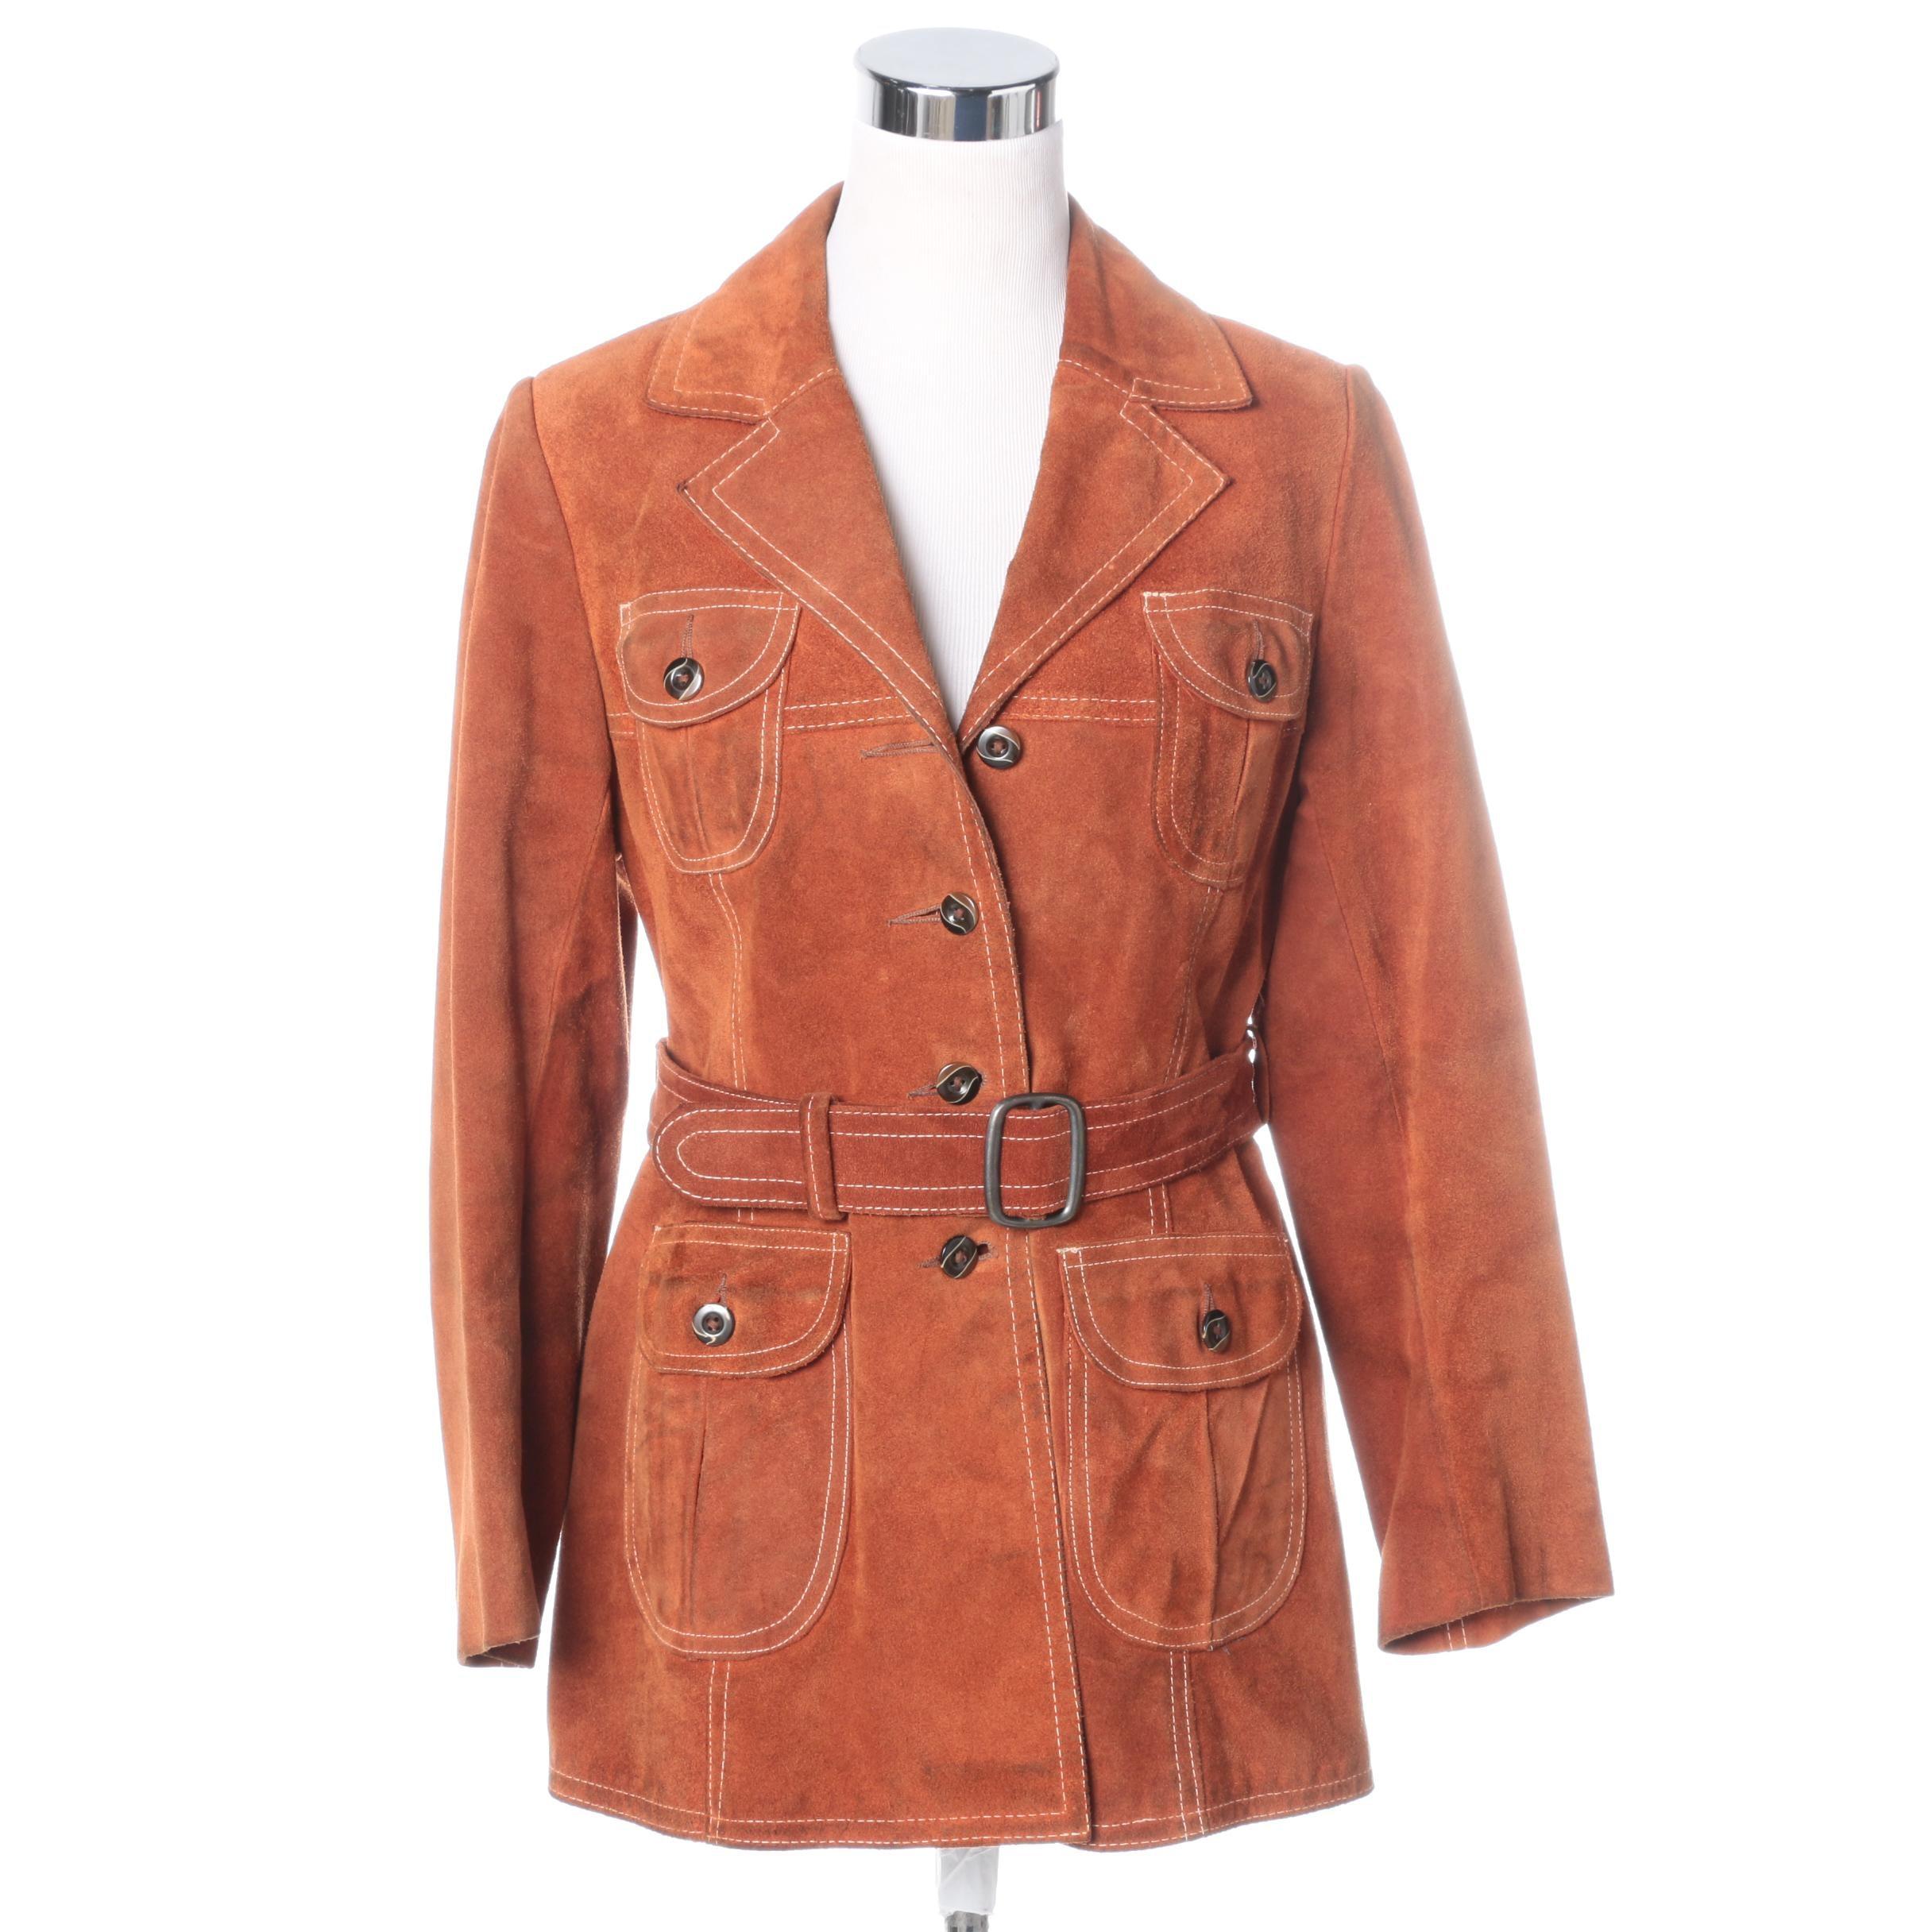 Vintage Young Dimensions Burnt Orange Suede Jacket